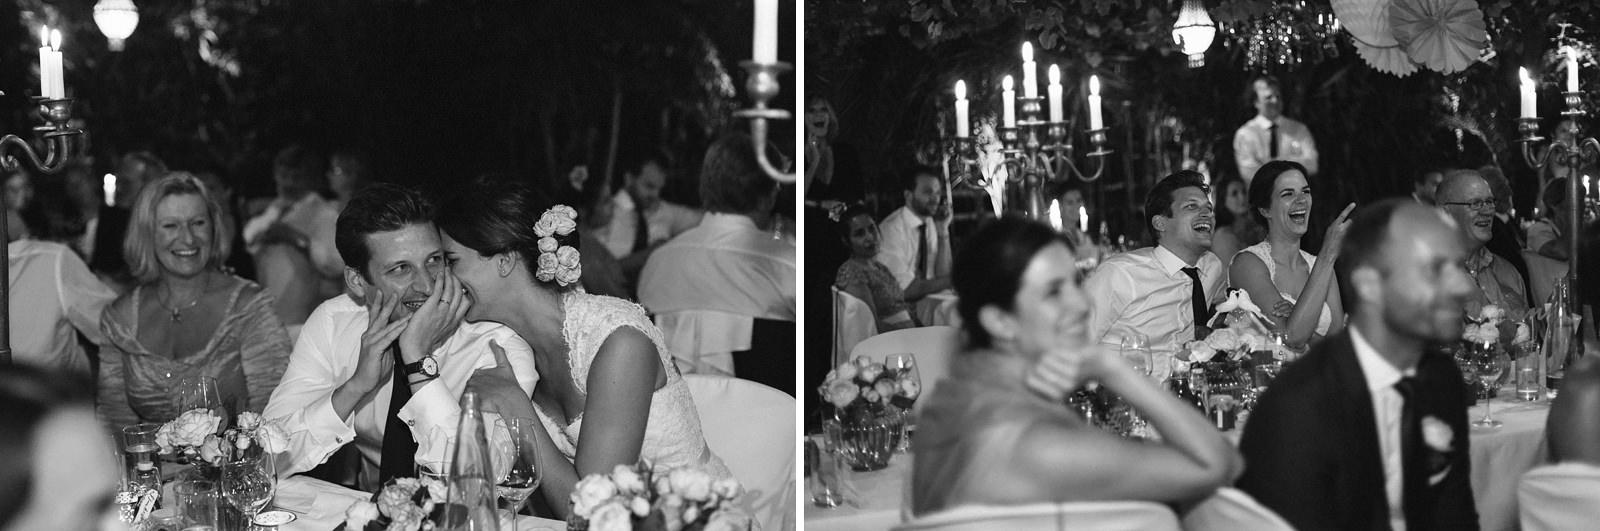 vsco kodak tmax wedding